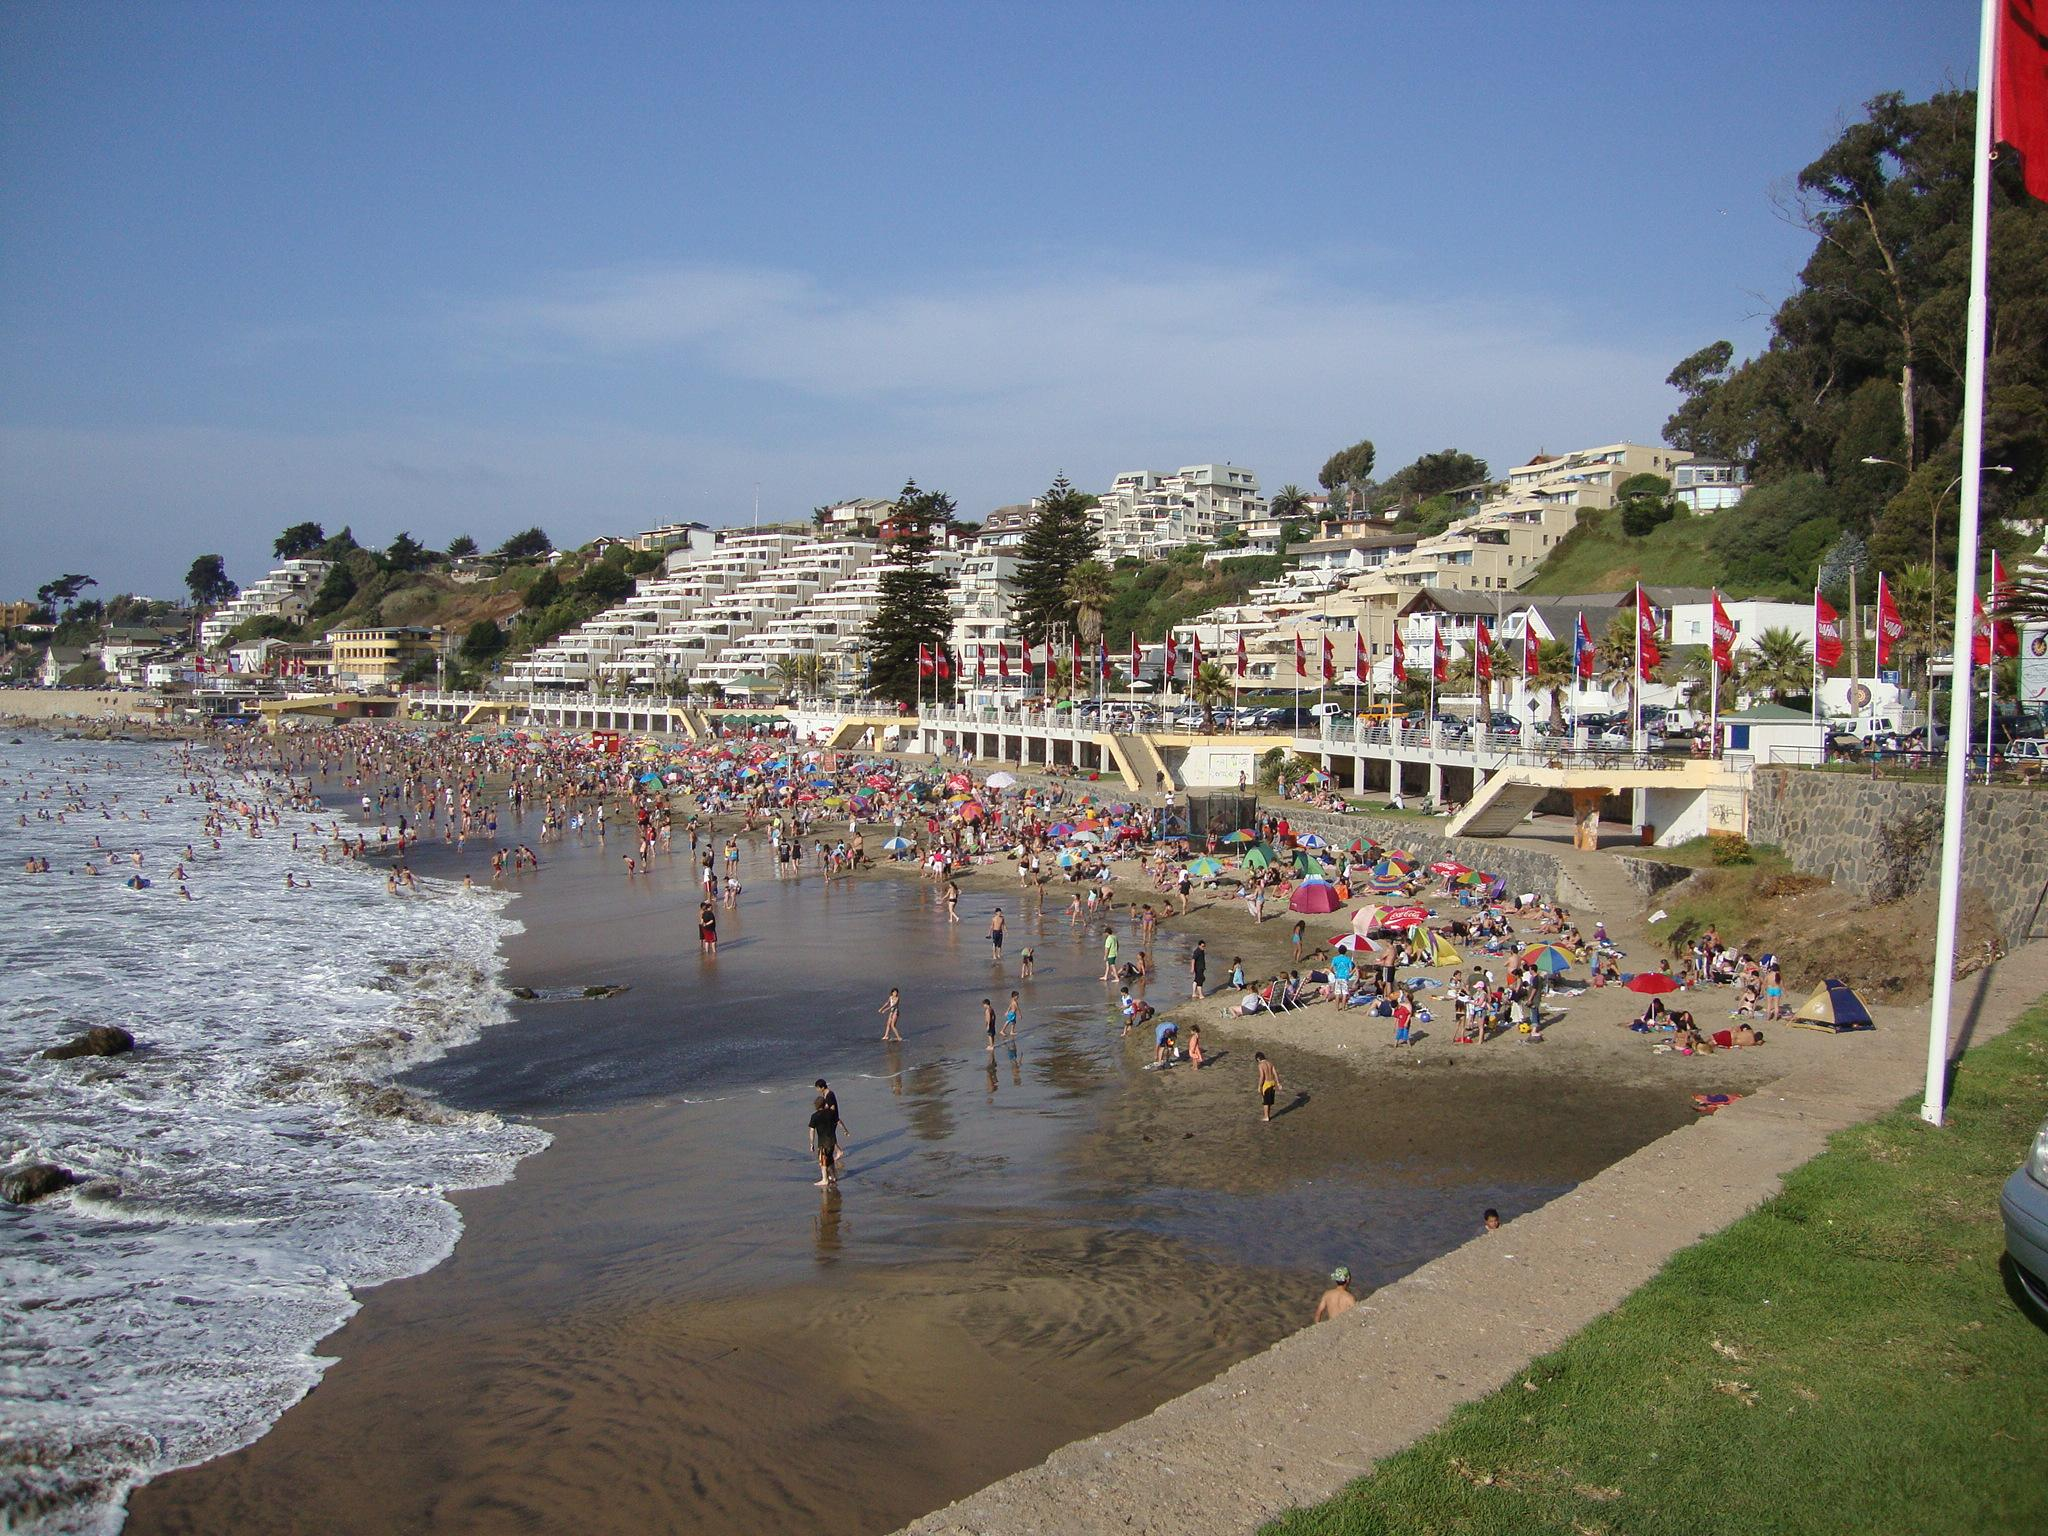 Concon Chile  city photos gallery : Playa Amarilla Concón Wikimedia Commons